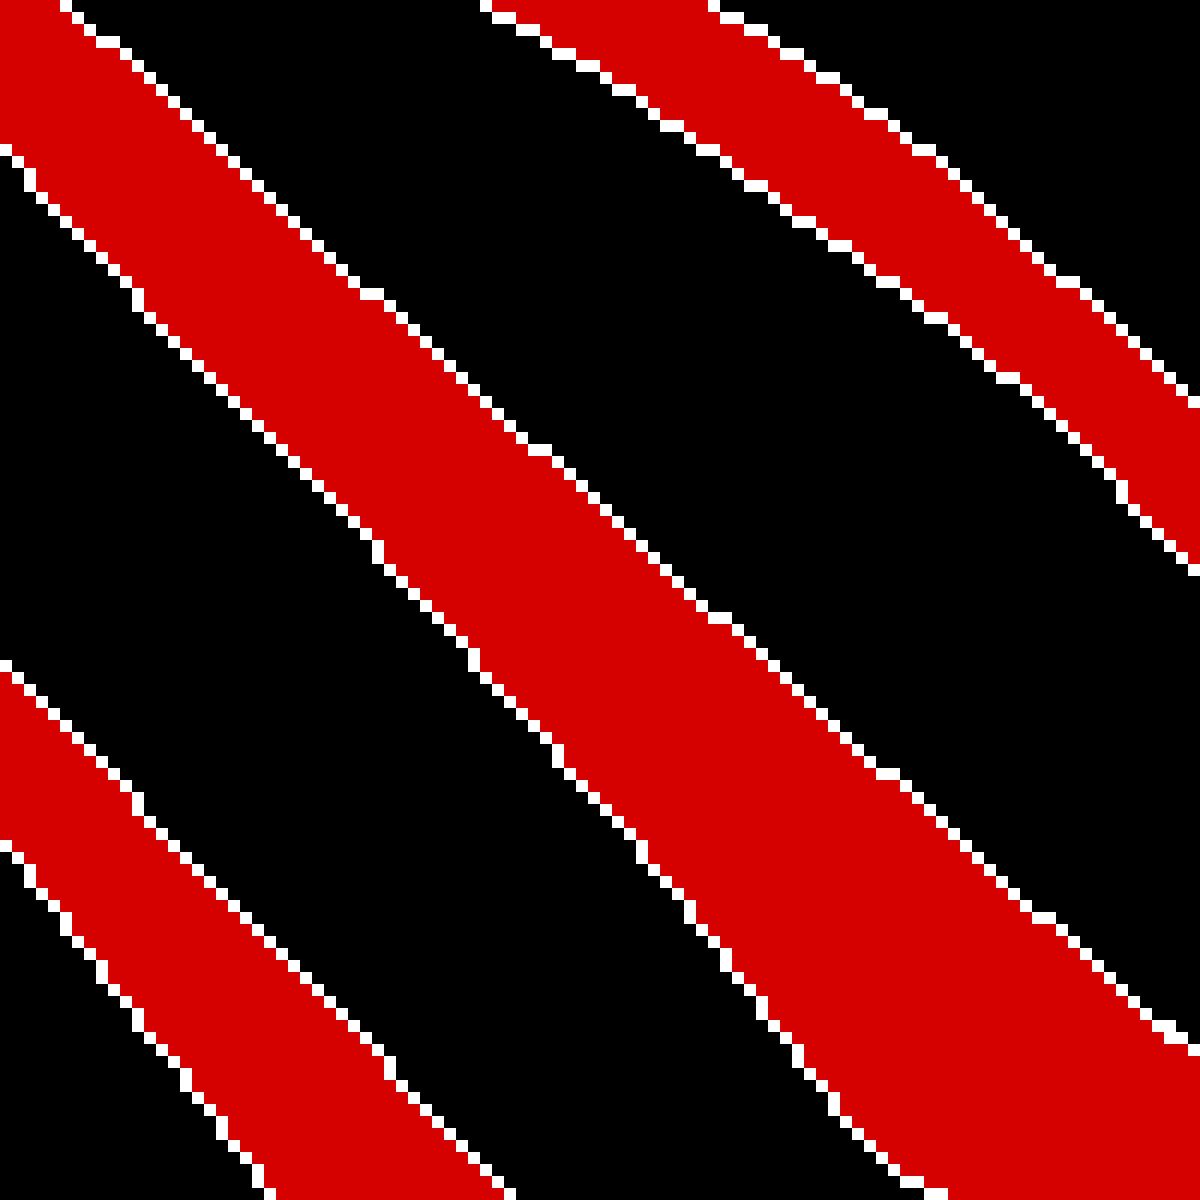 stripes by Lunarart64